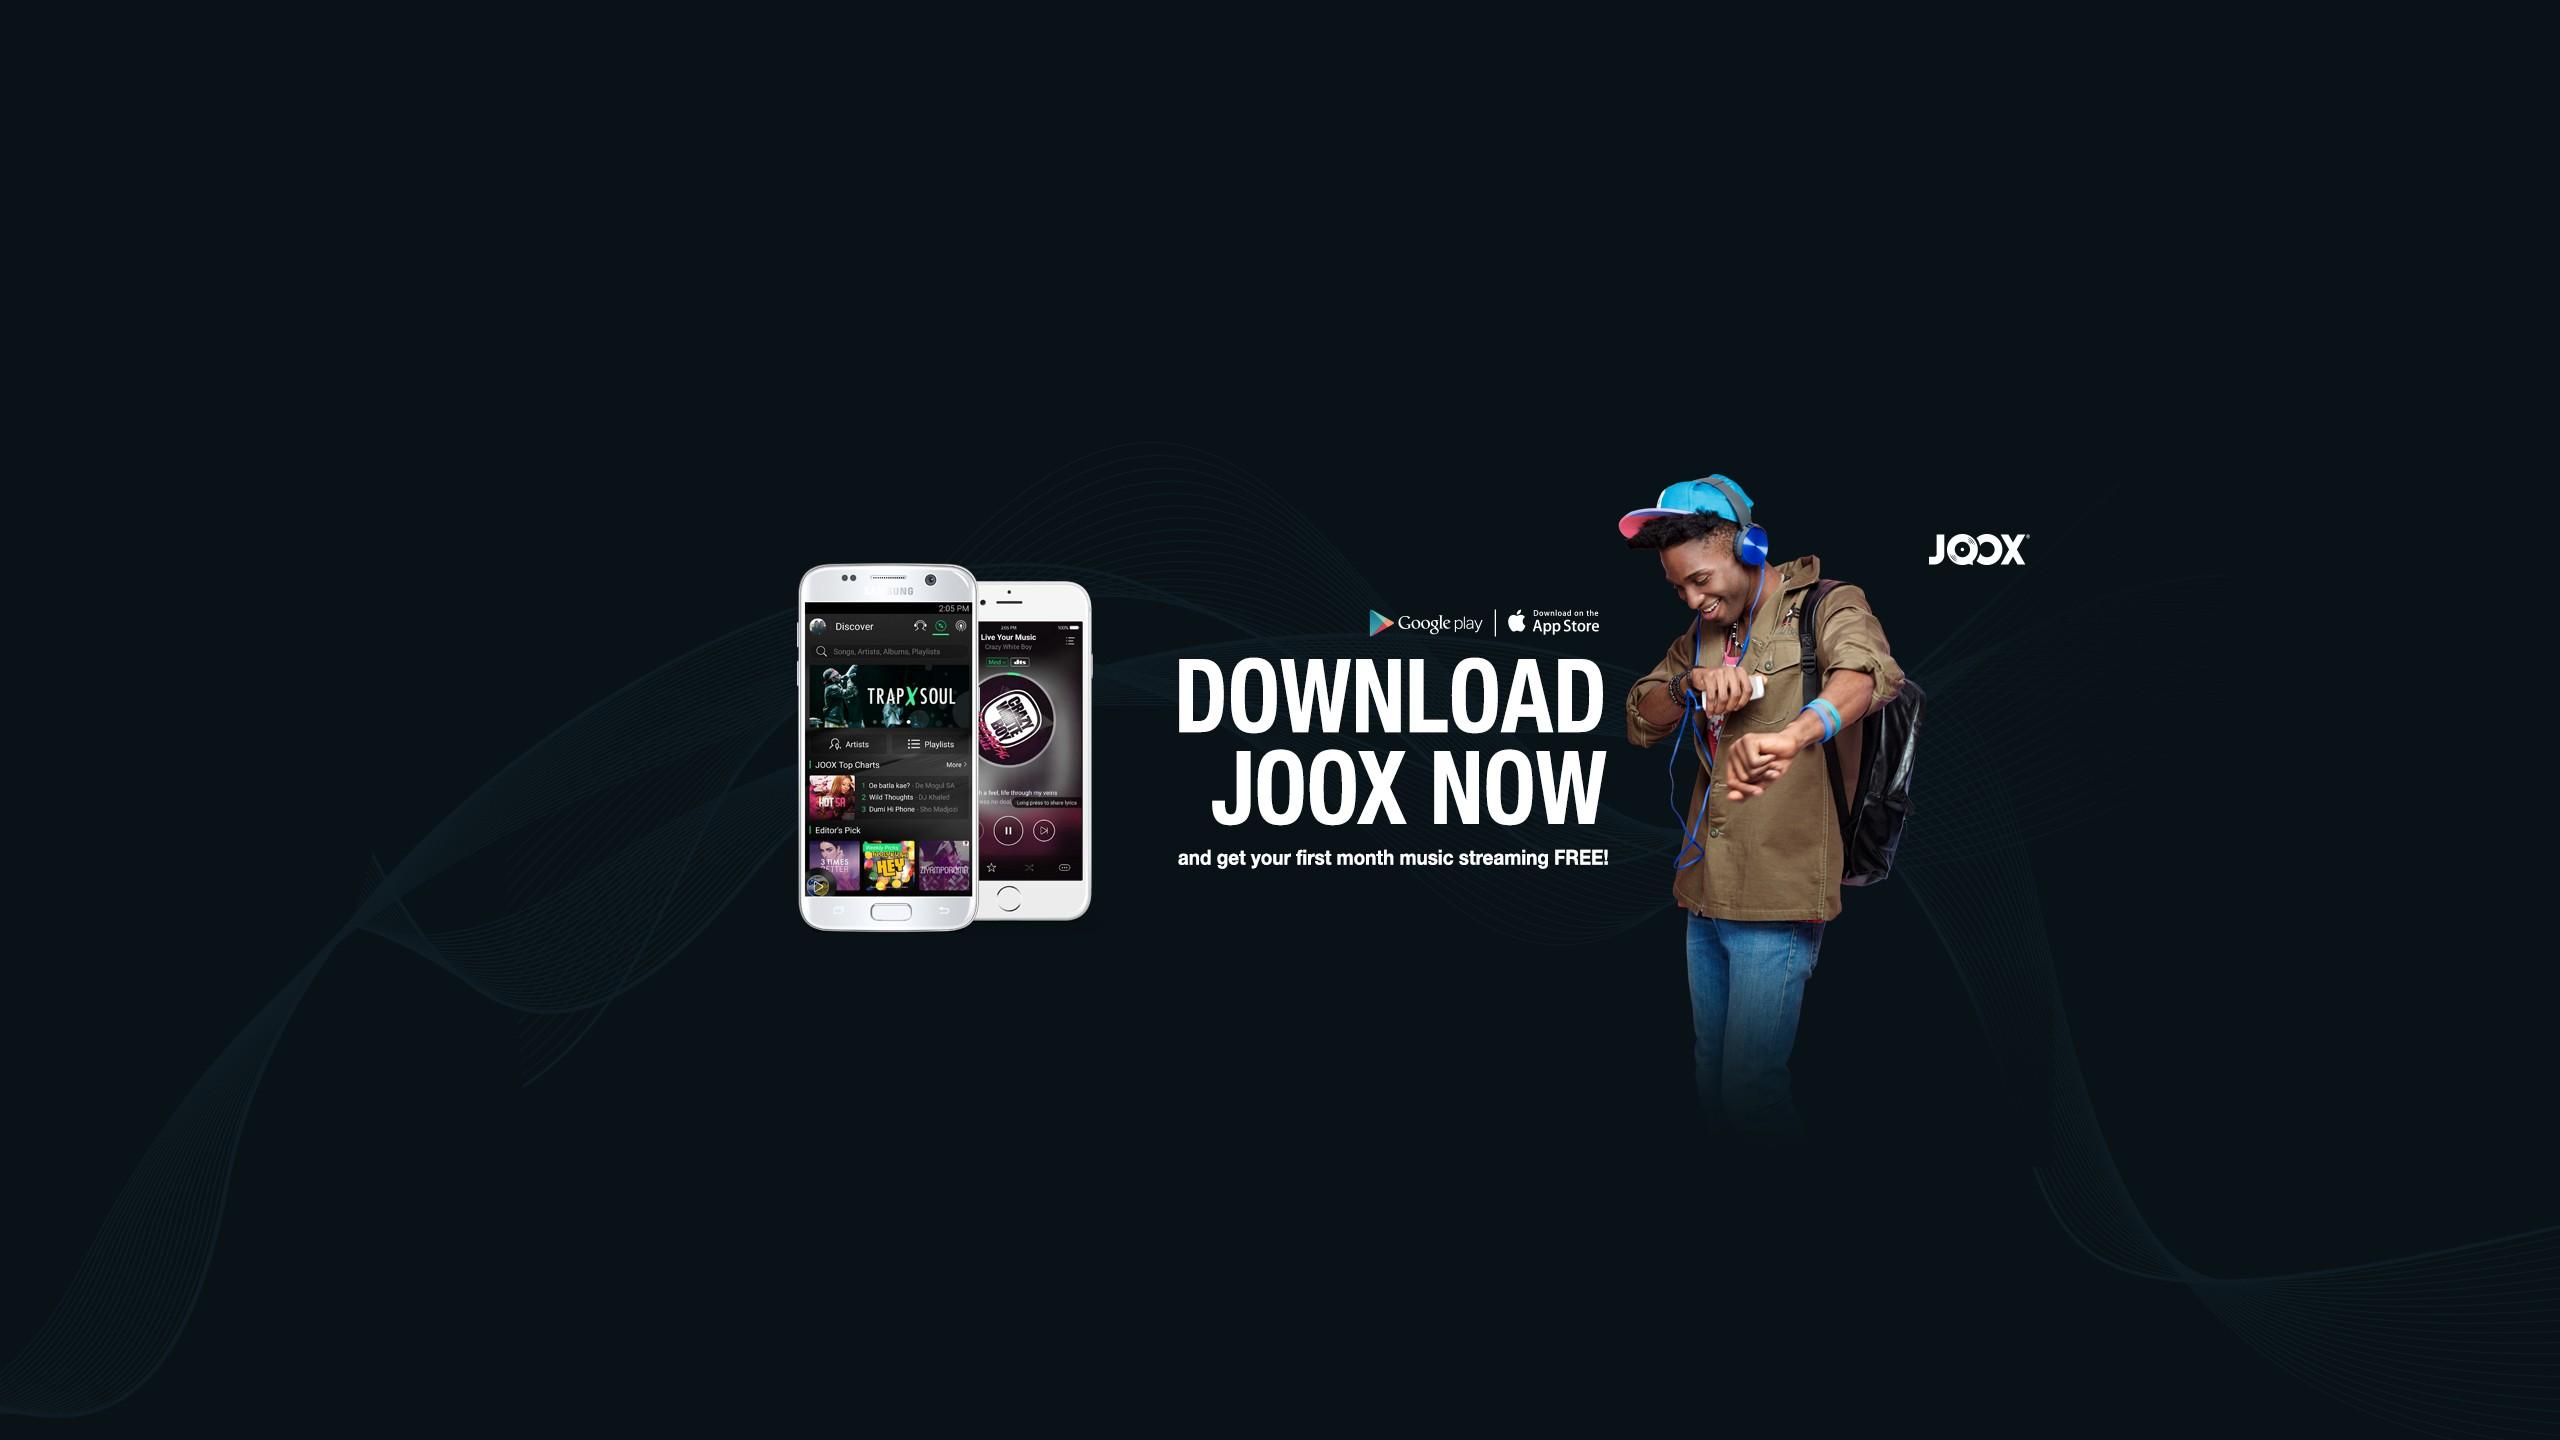 JOOX South Africa | LinkedIn